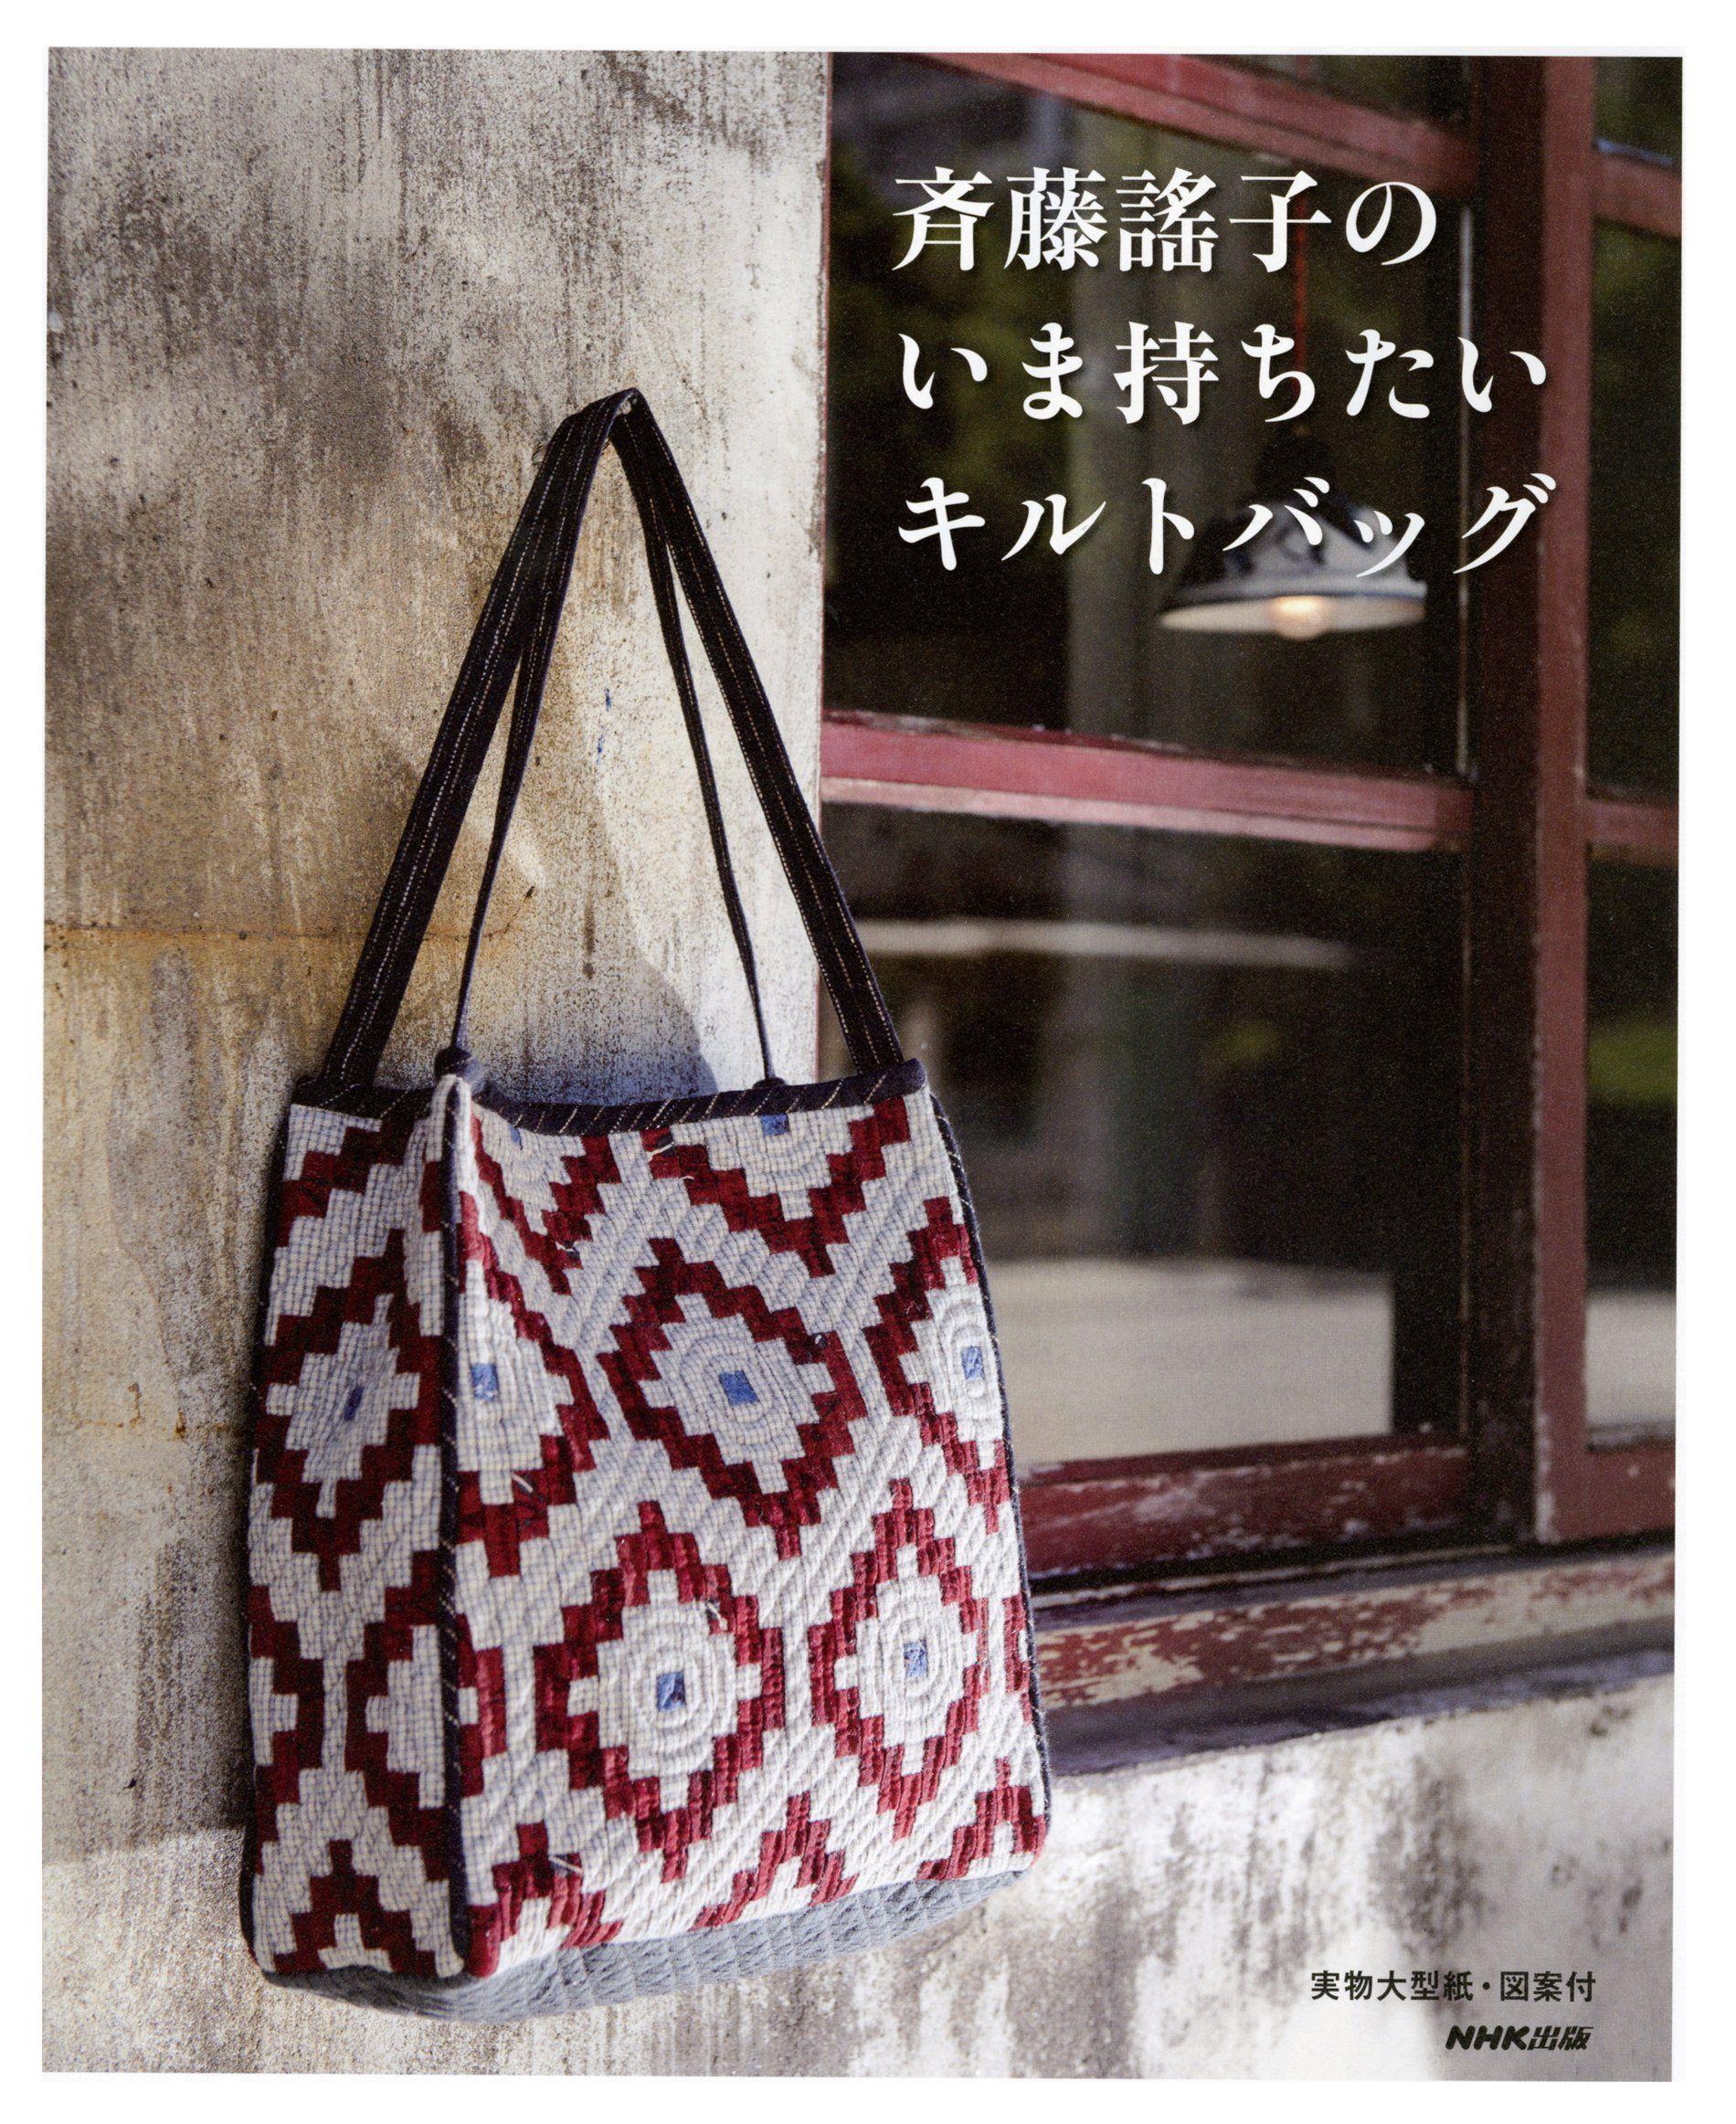 Quilt bag of Yoko Saito | Ляпочиха | Pinterest